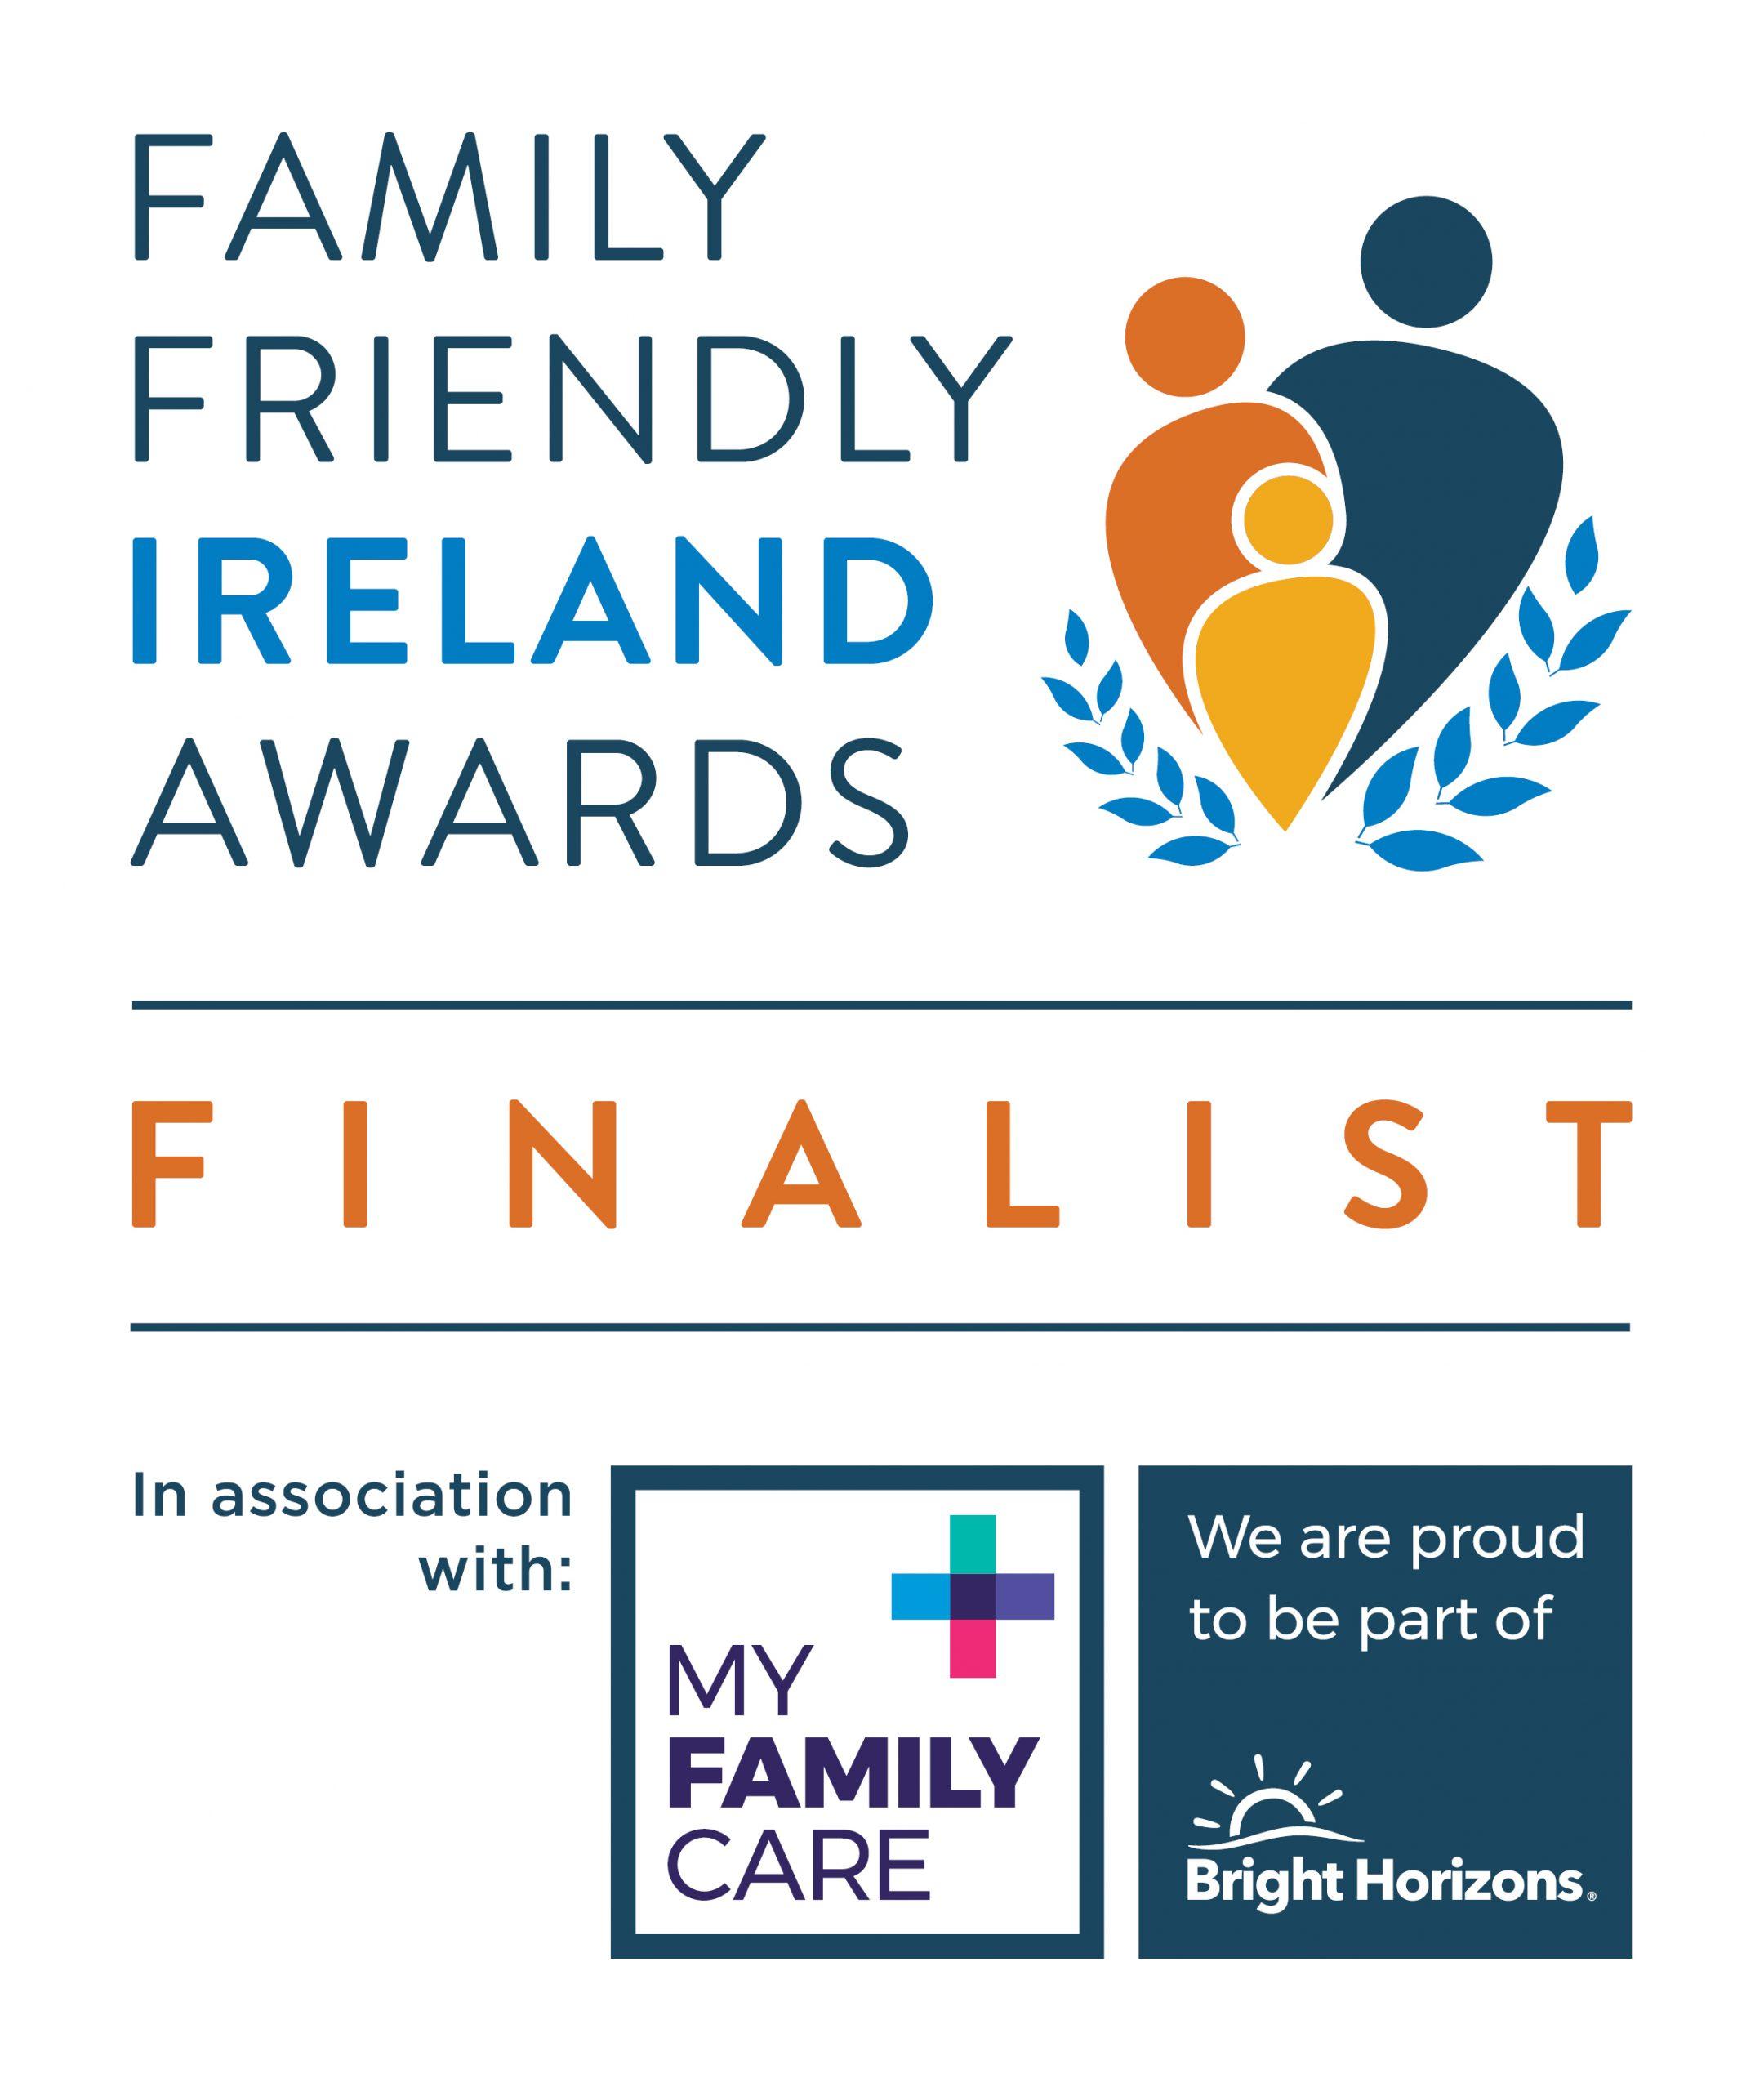 Family Friendly Awards Finalist